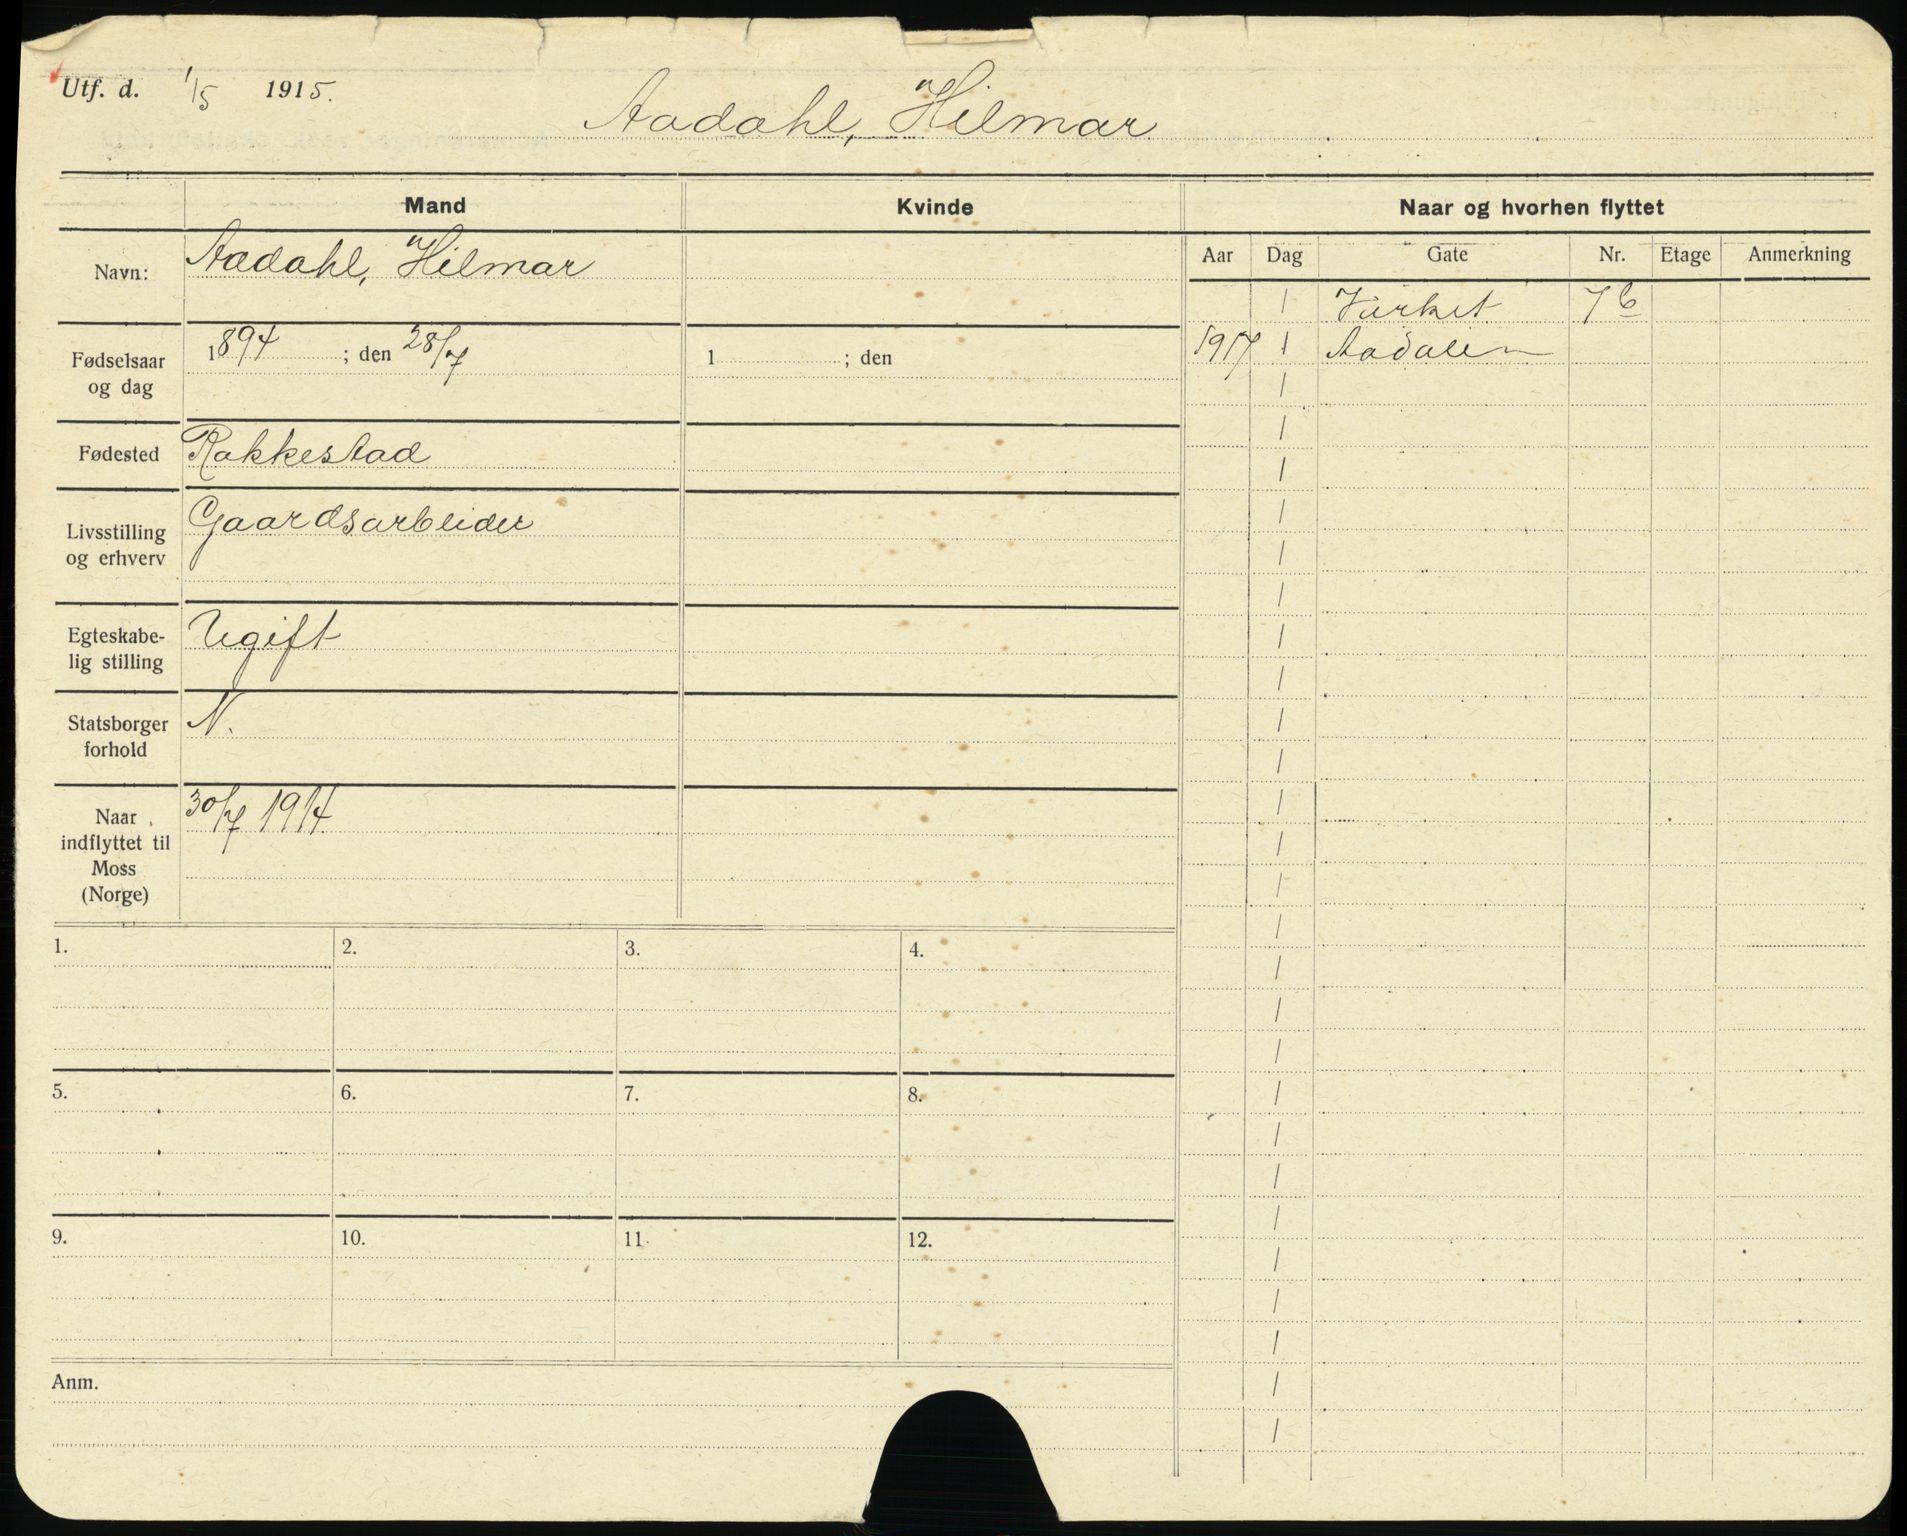 SAO, Moss folkeregister, F/L0003: Utflyttede, 1917-1918